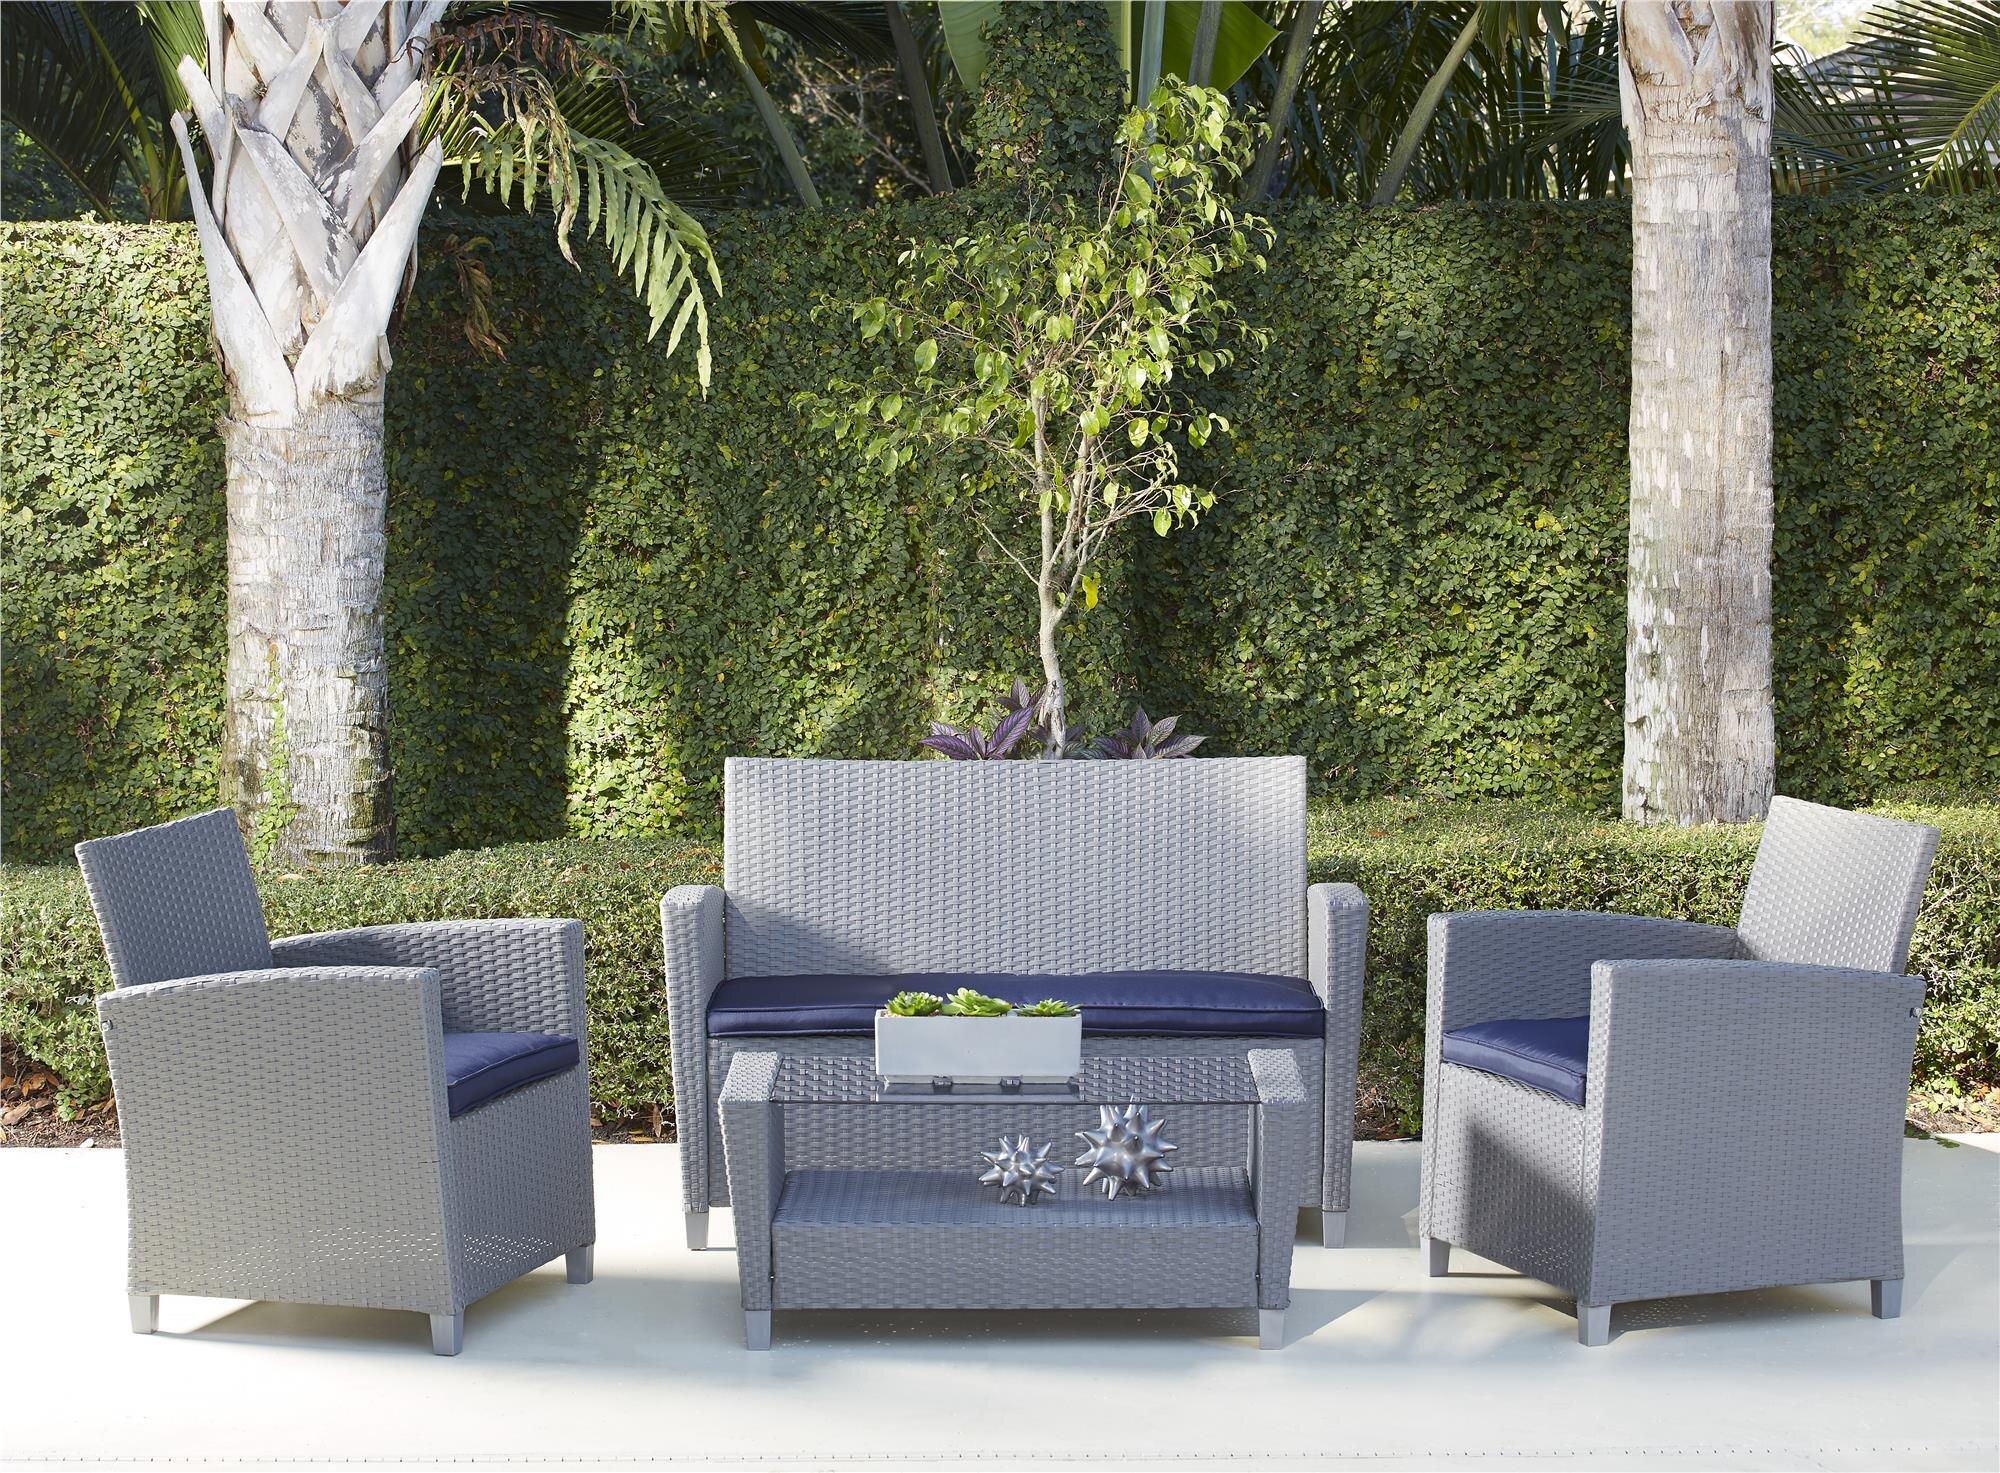 Sol 72 Outdoor Lancashire 4 Piece Rattan Sofa Seating Group With Cushions Reviews Wayfair